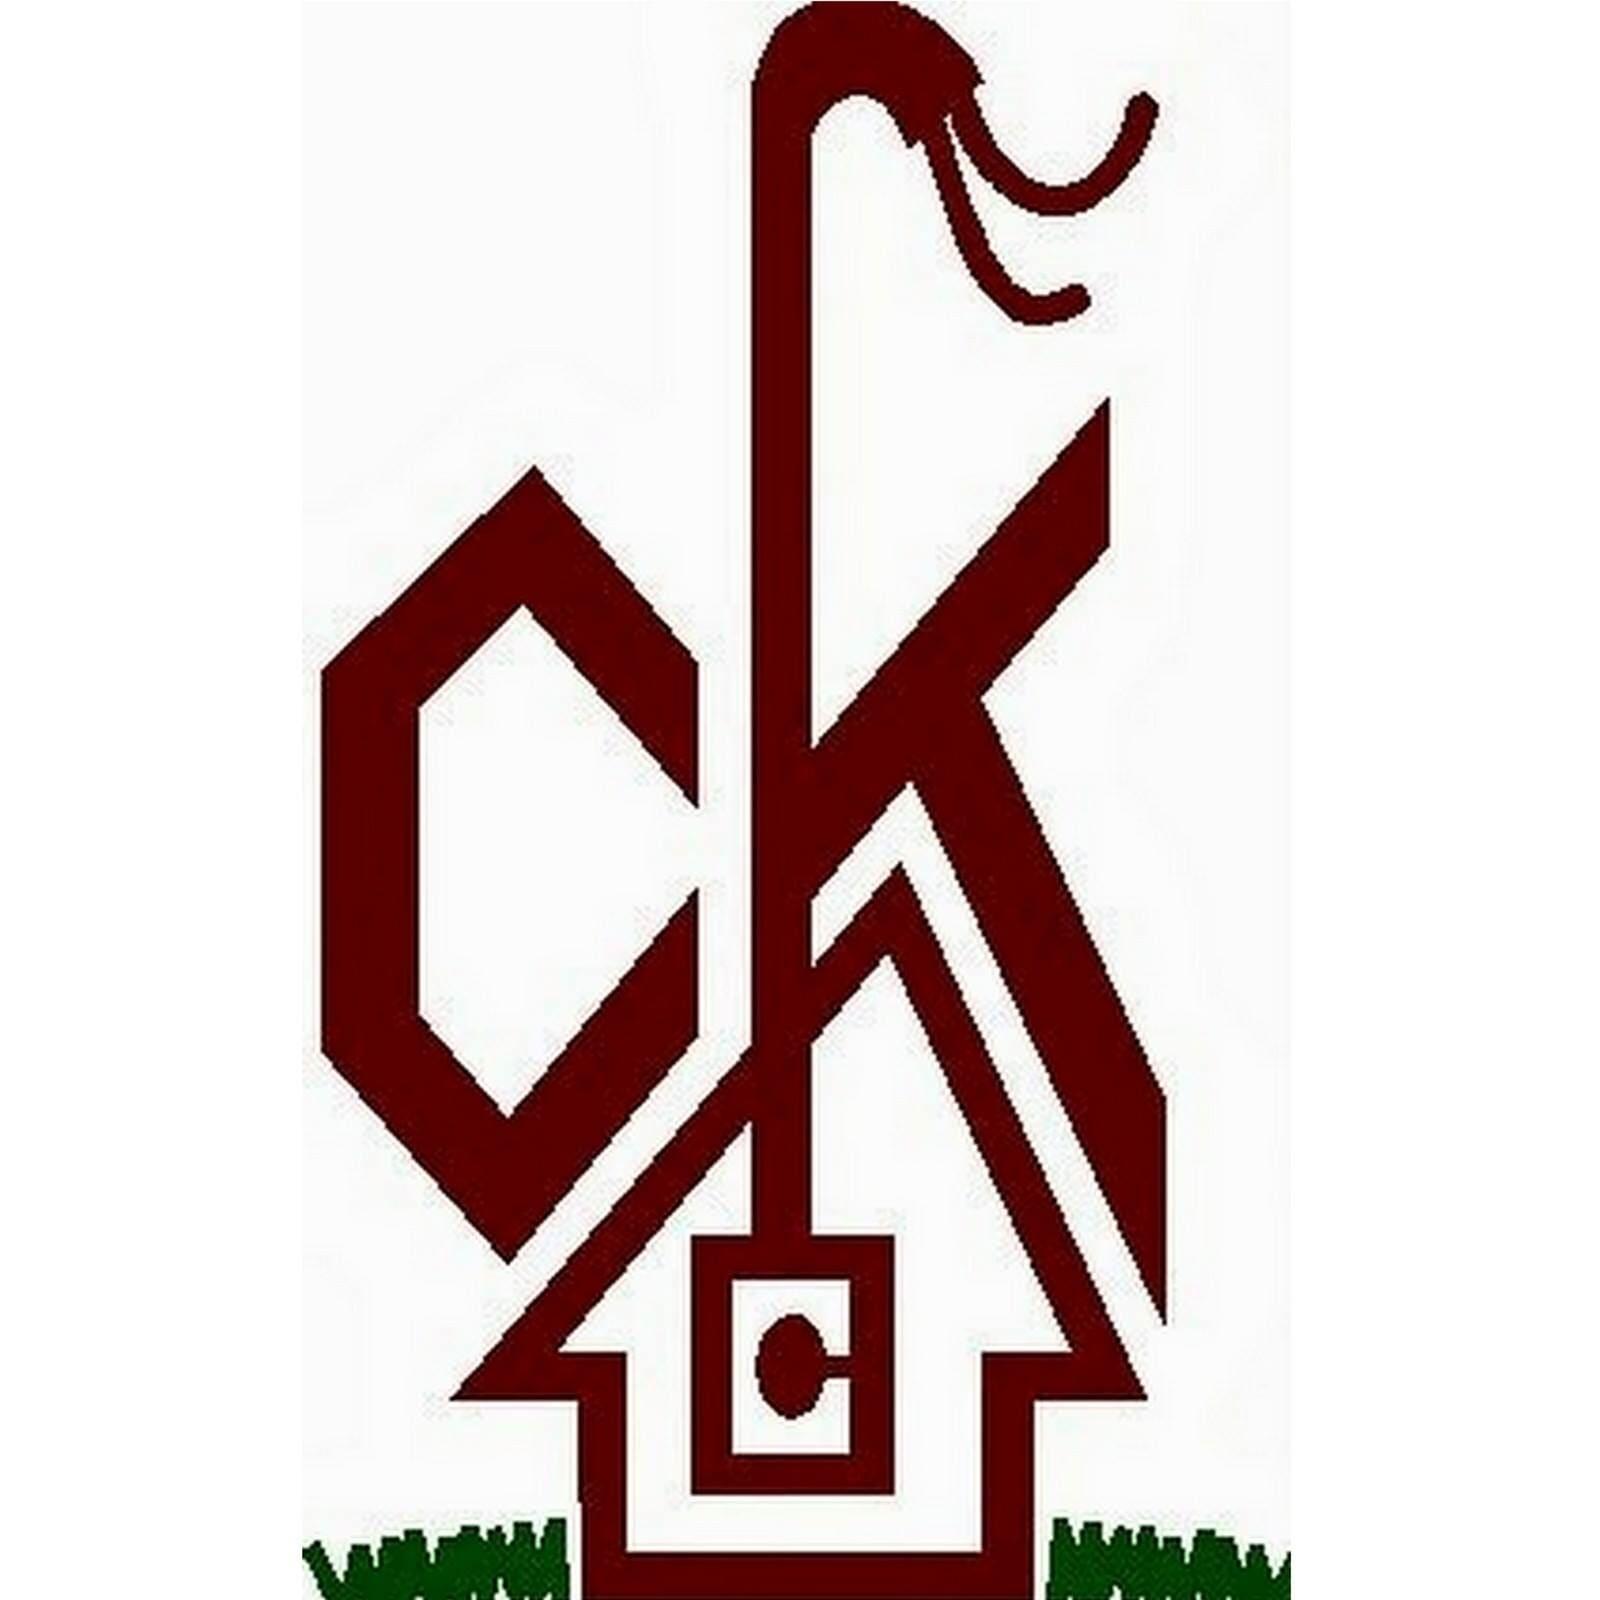 CK Electric LLC